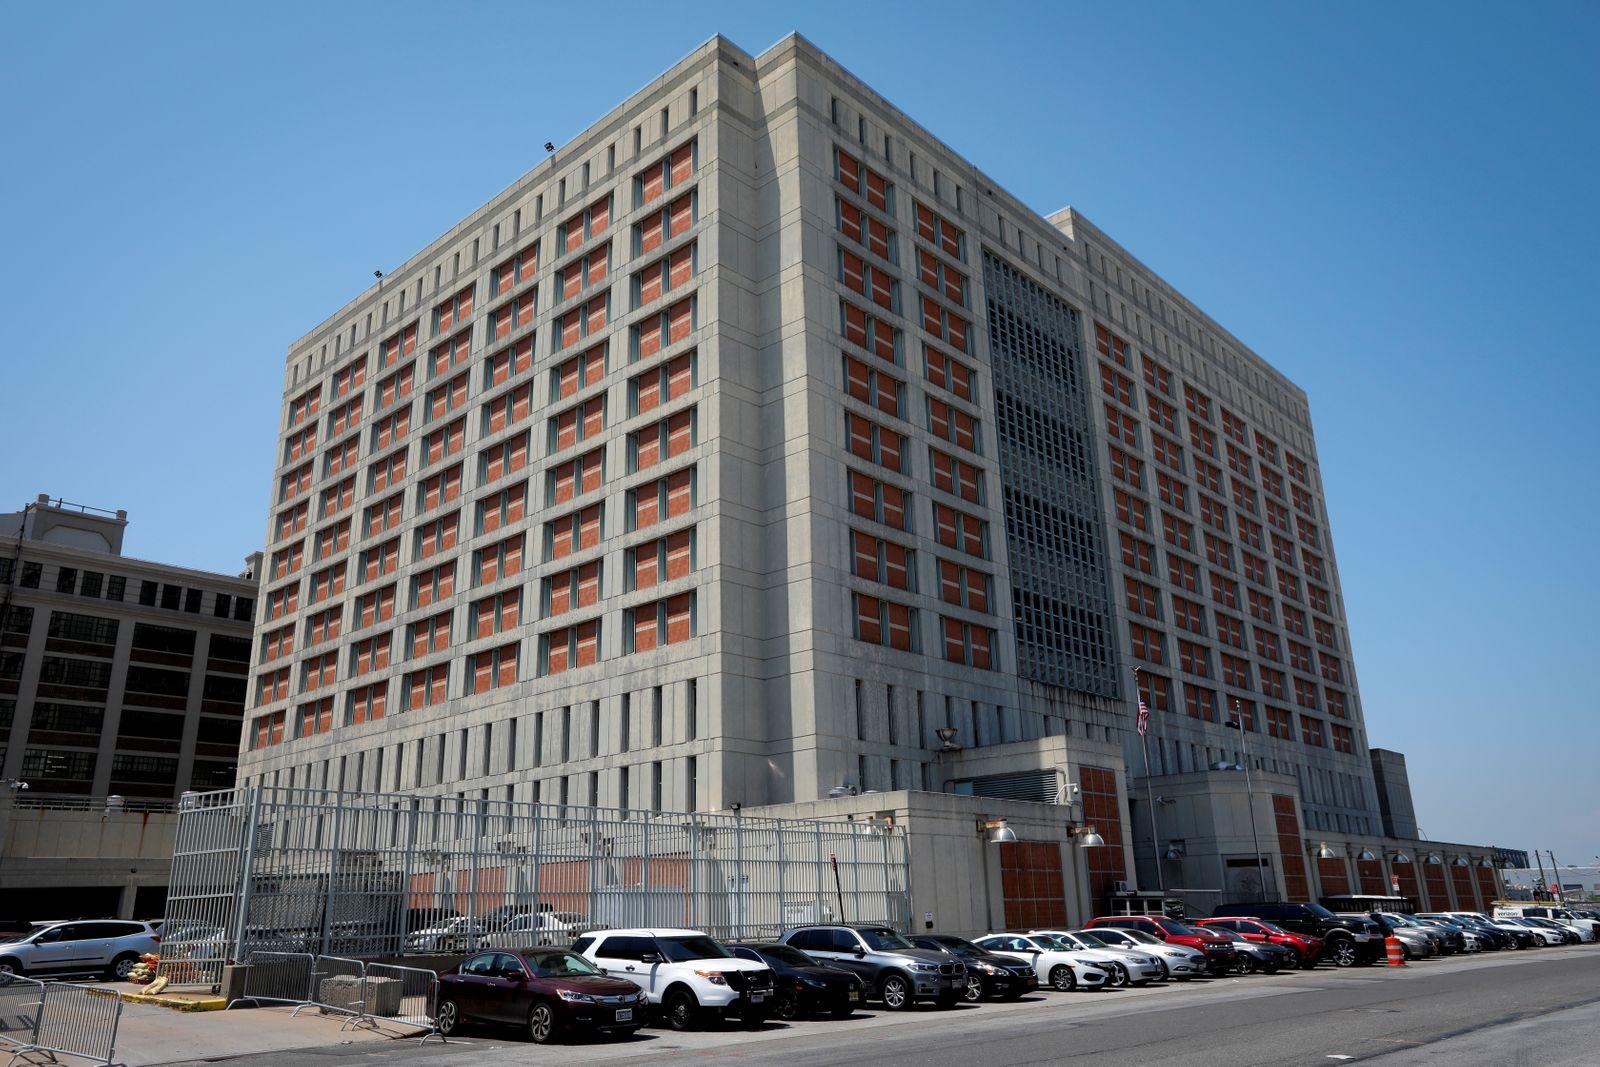 Metropolitan Detention Center where Ghislaine Maxwell is being held in Brooklyn New York